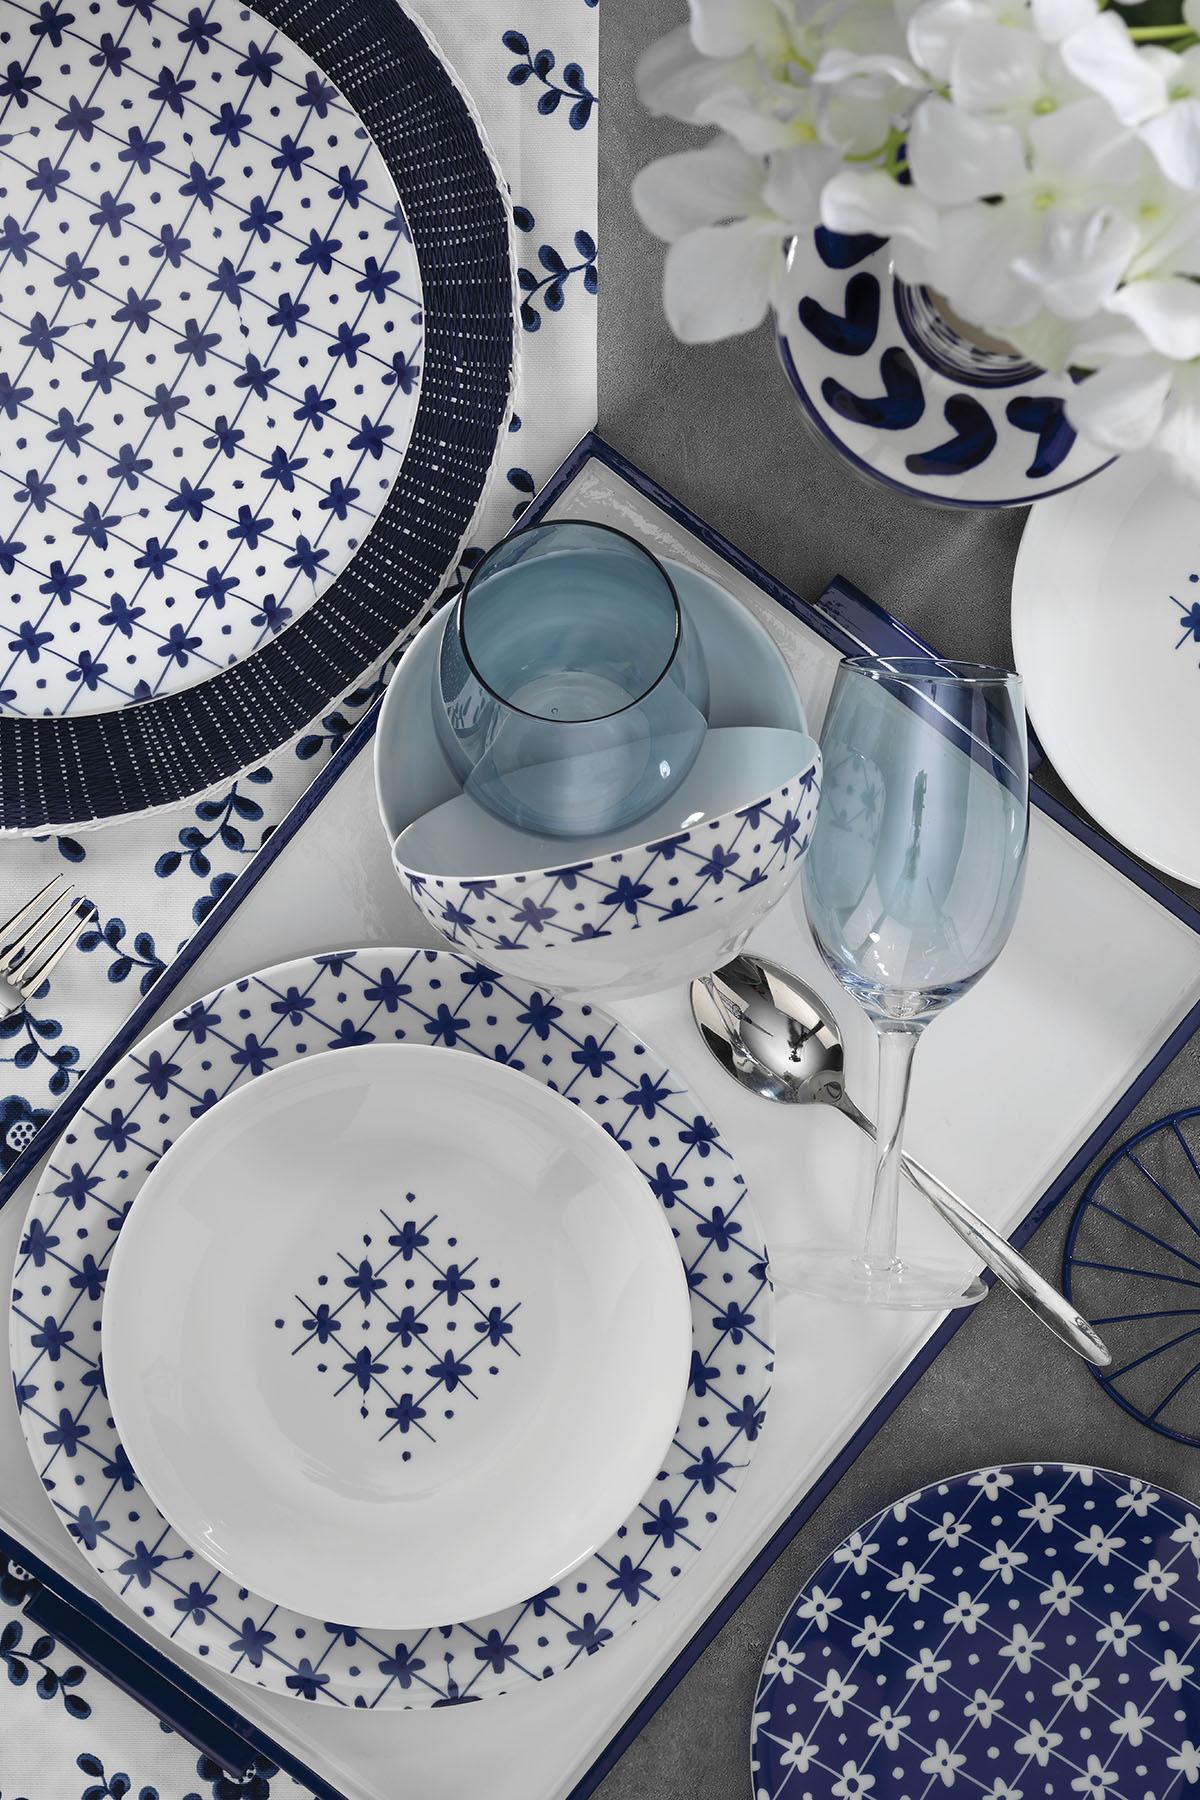 Kütahya Porselen - Kütahya Porselen 10044 Desen 24 Parça Yemek Seti